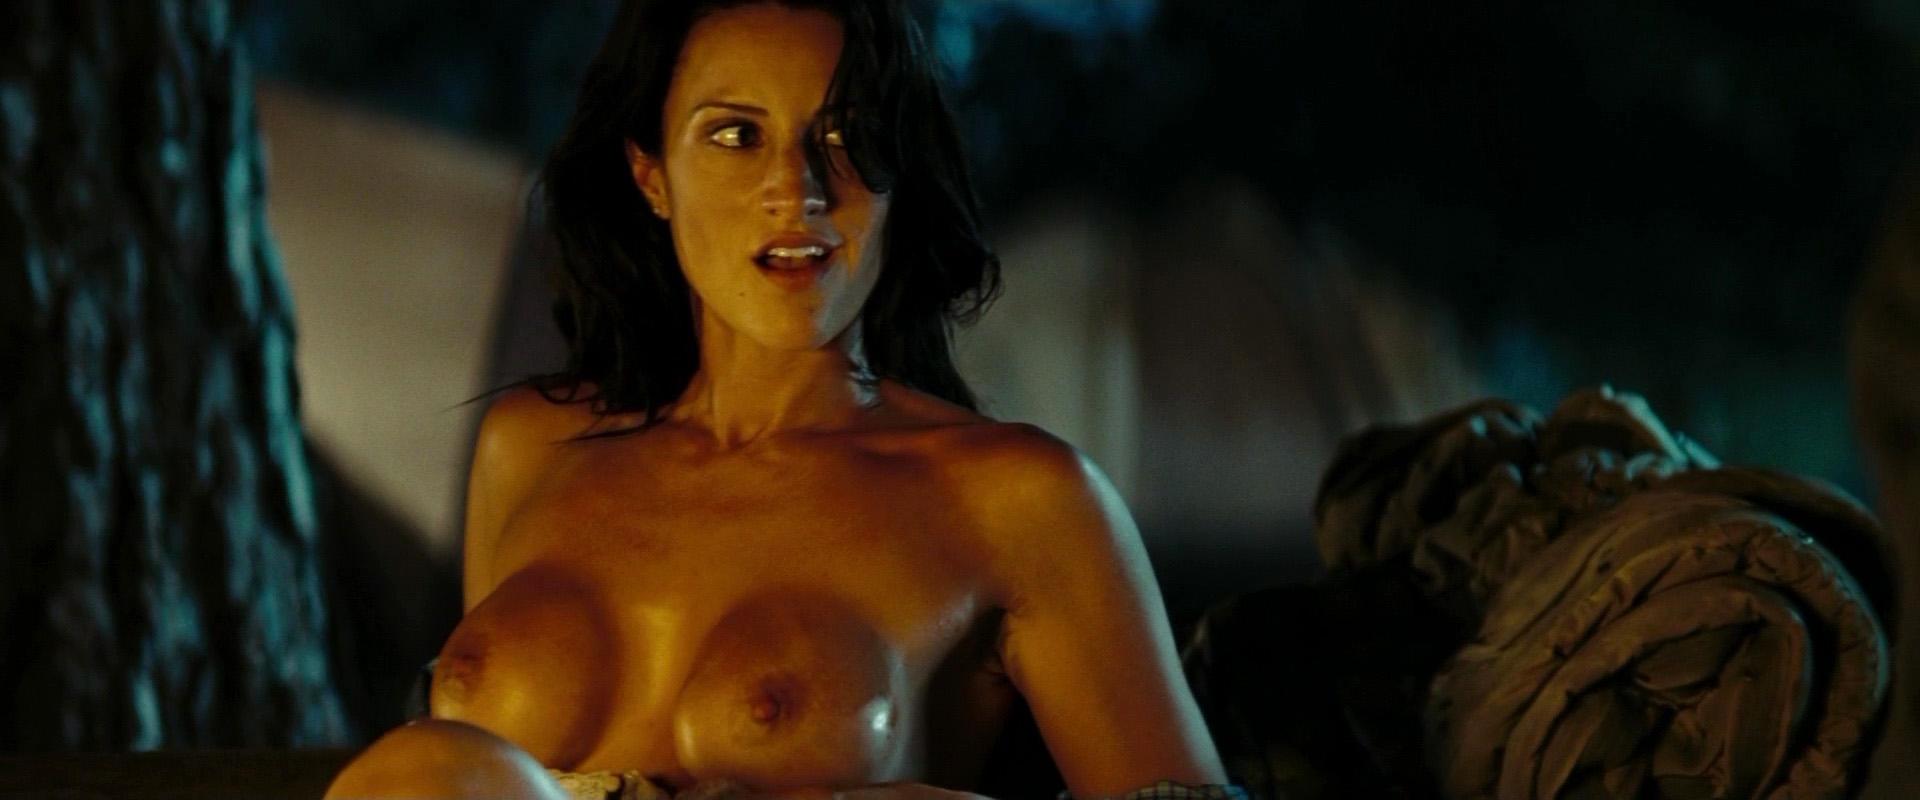 America Olivo Video Porno watch online - america olivo – friday the 13th (2009) hd 1080p